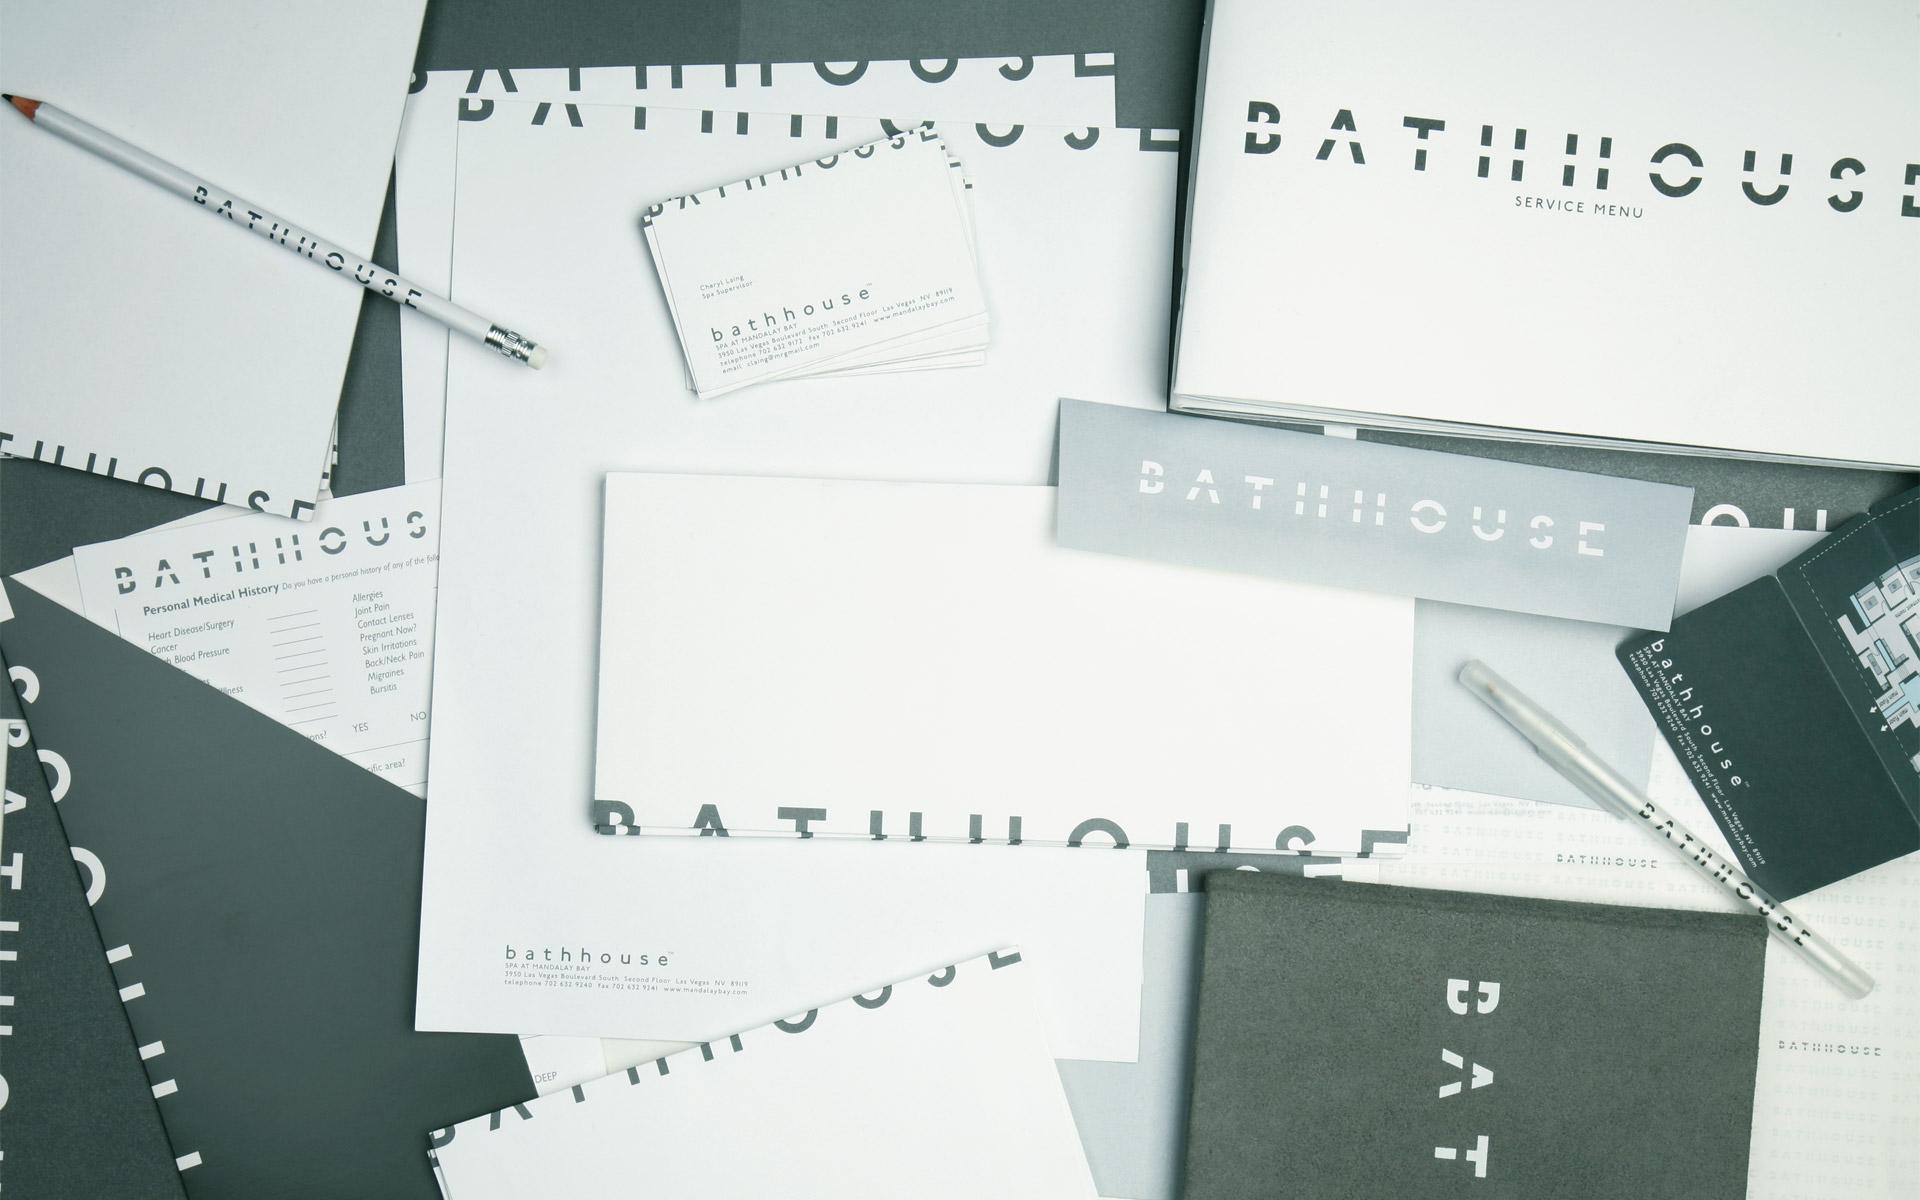 20150102-Bathhouse-1.jpg